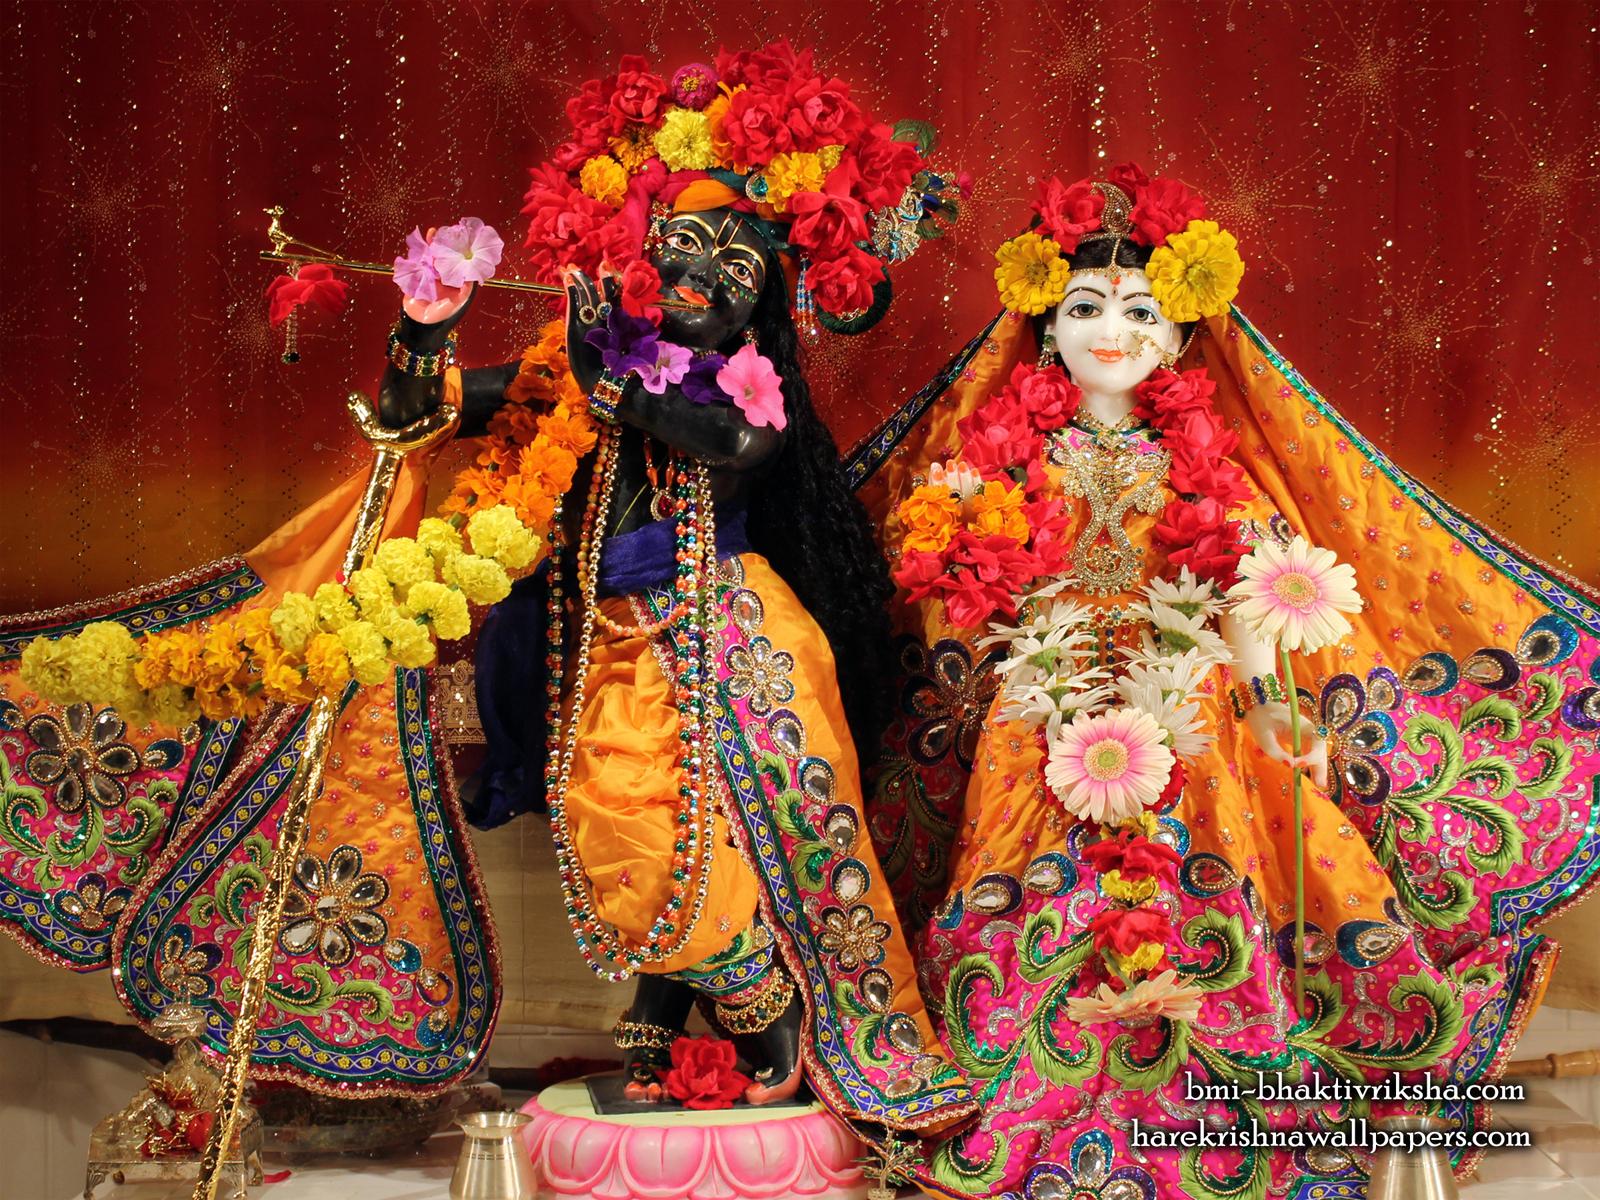 Sri Sri Radha Shyamsundar Wallpaper (001) Size1600x1200 Download